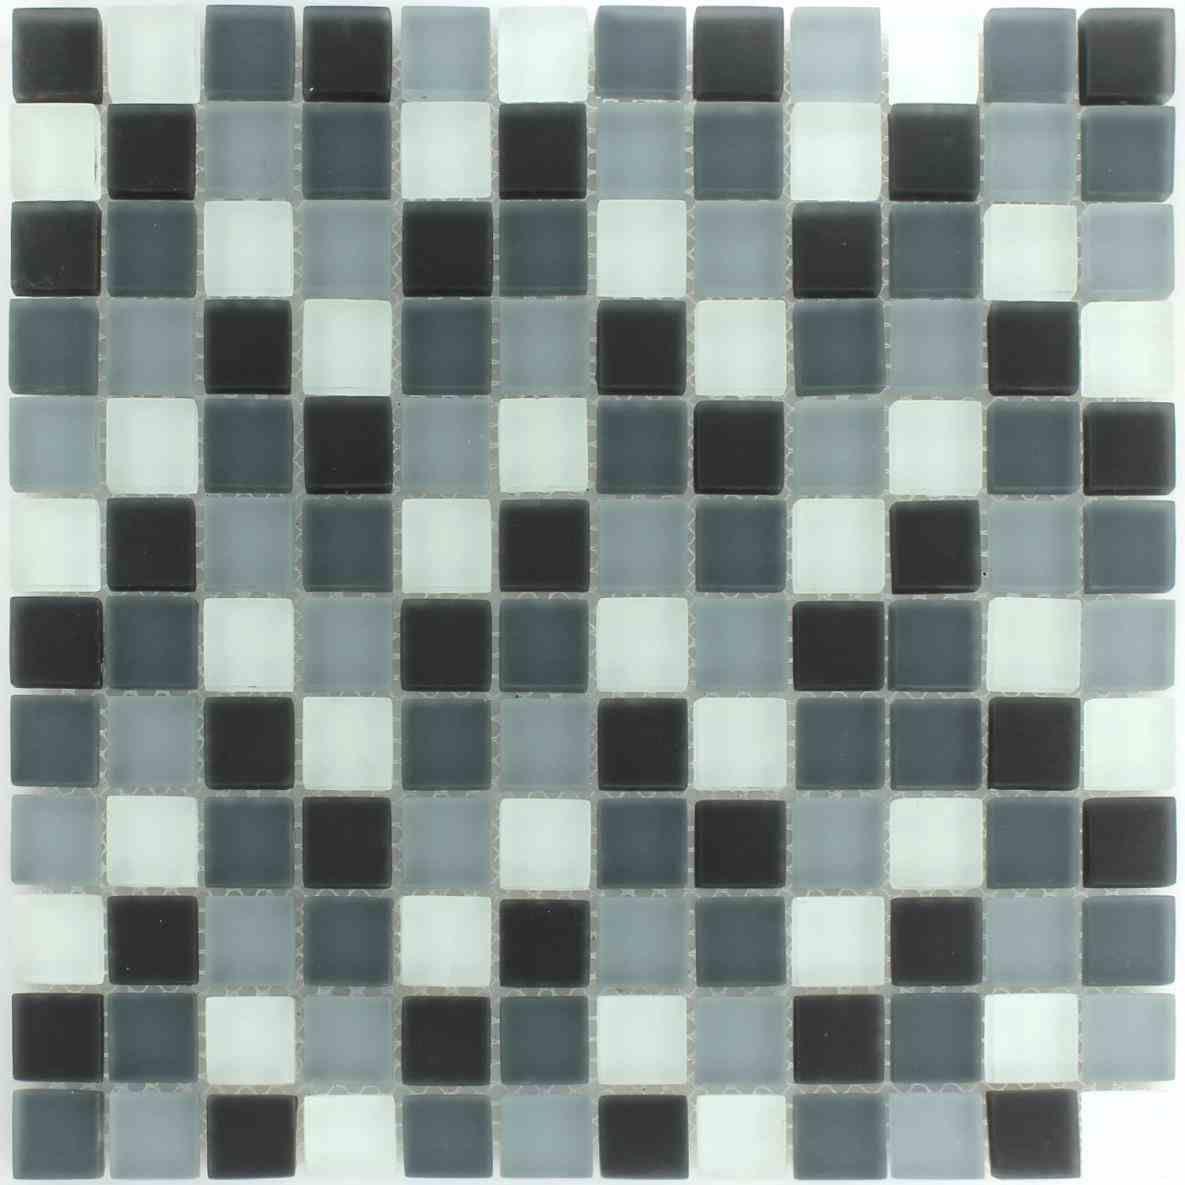 Pin By Brandle On Mosaik Fliesen Anthrazit Pinterest - Mosaik fliesen 5x5cm